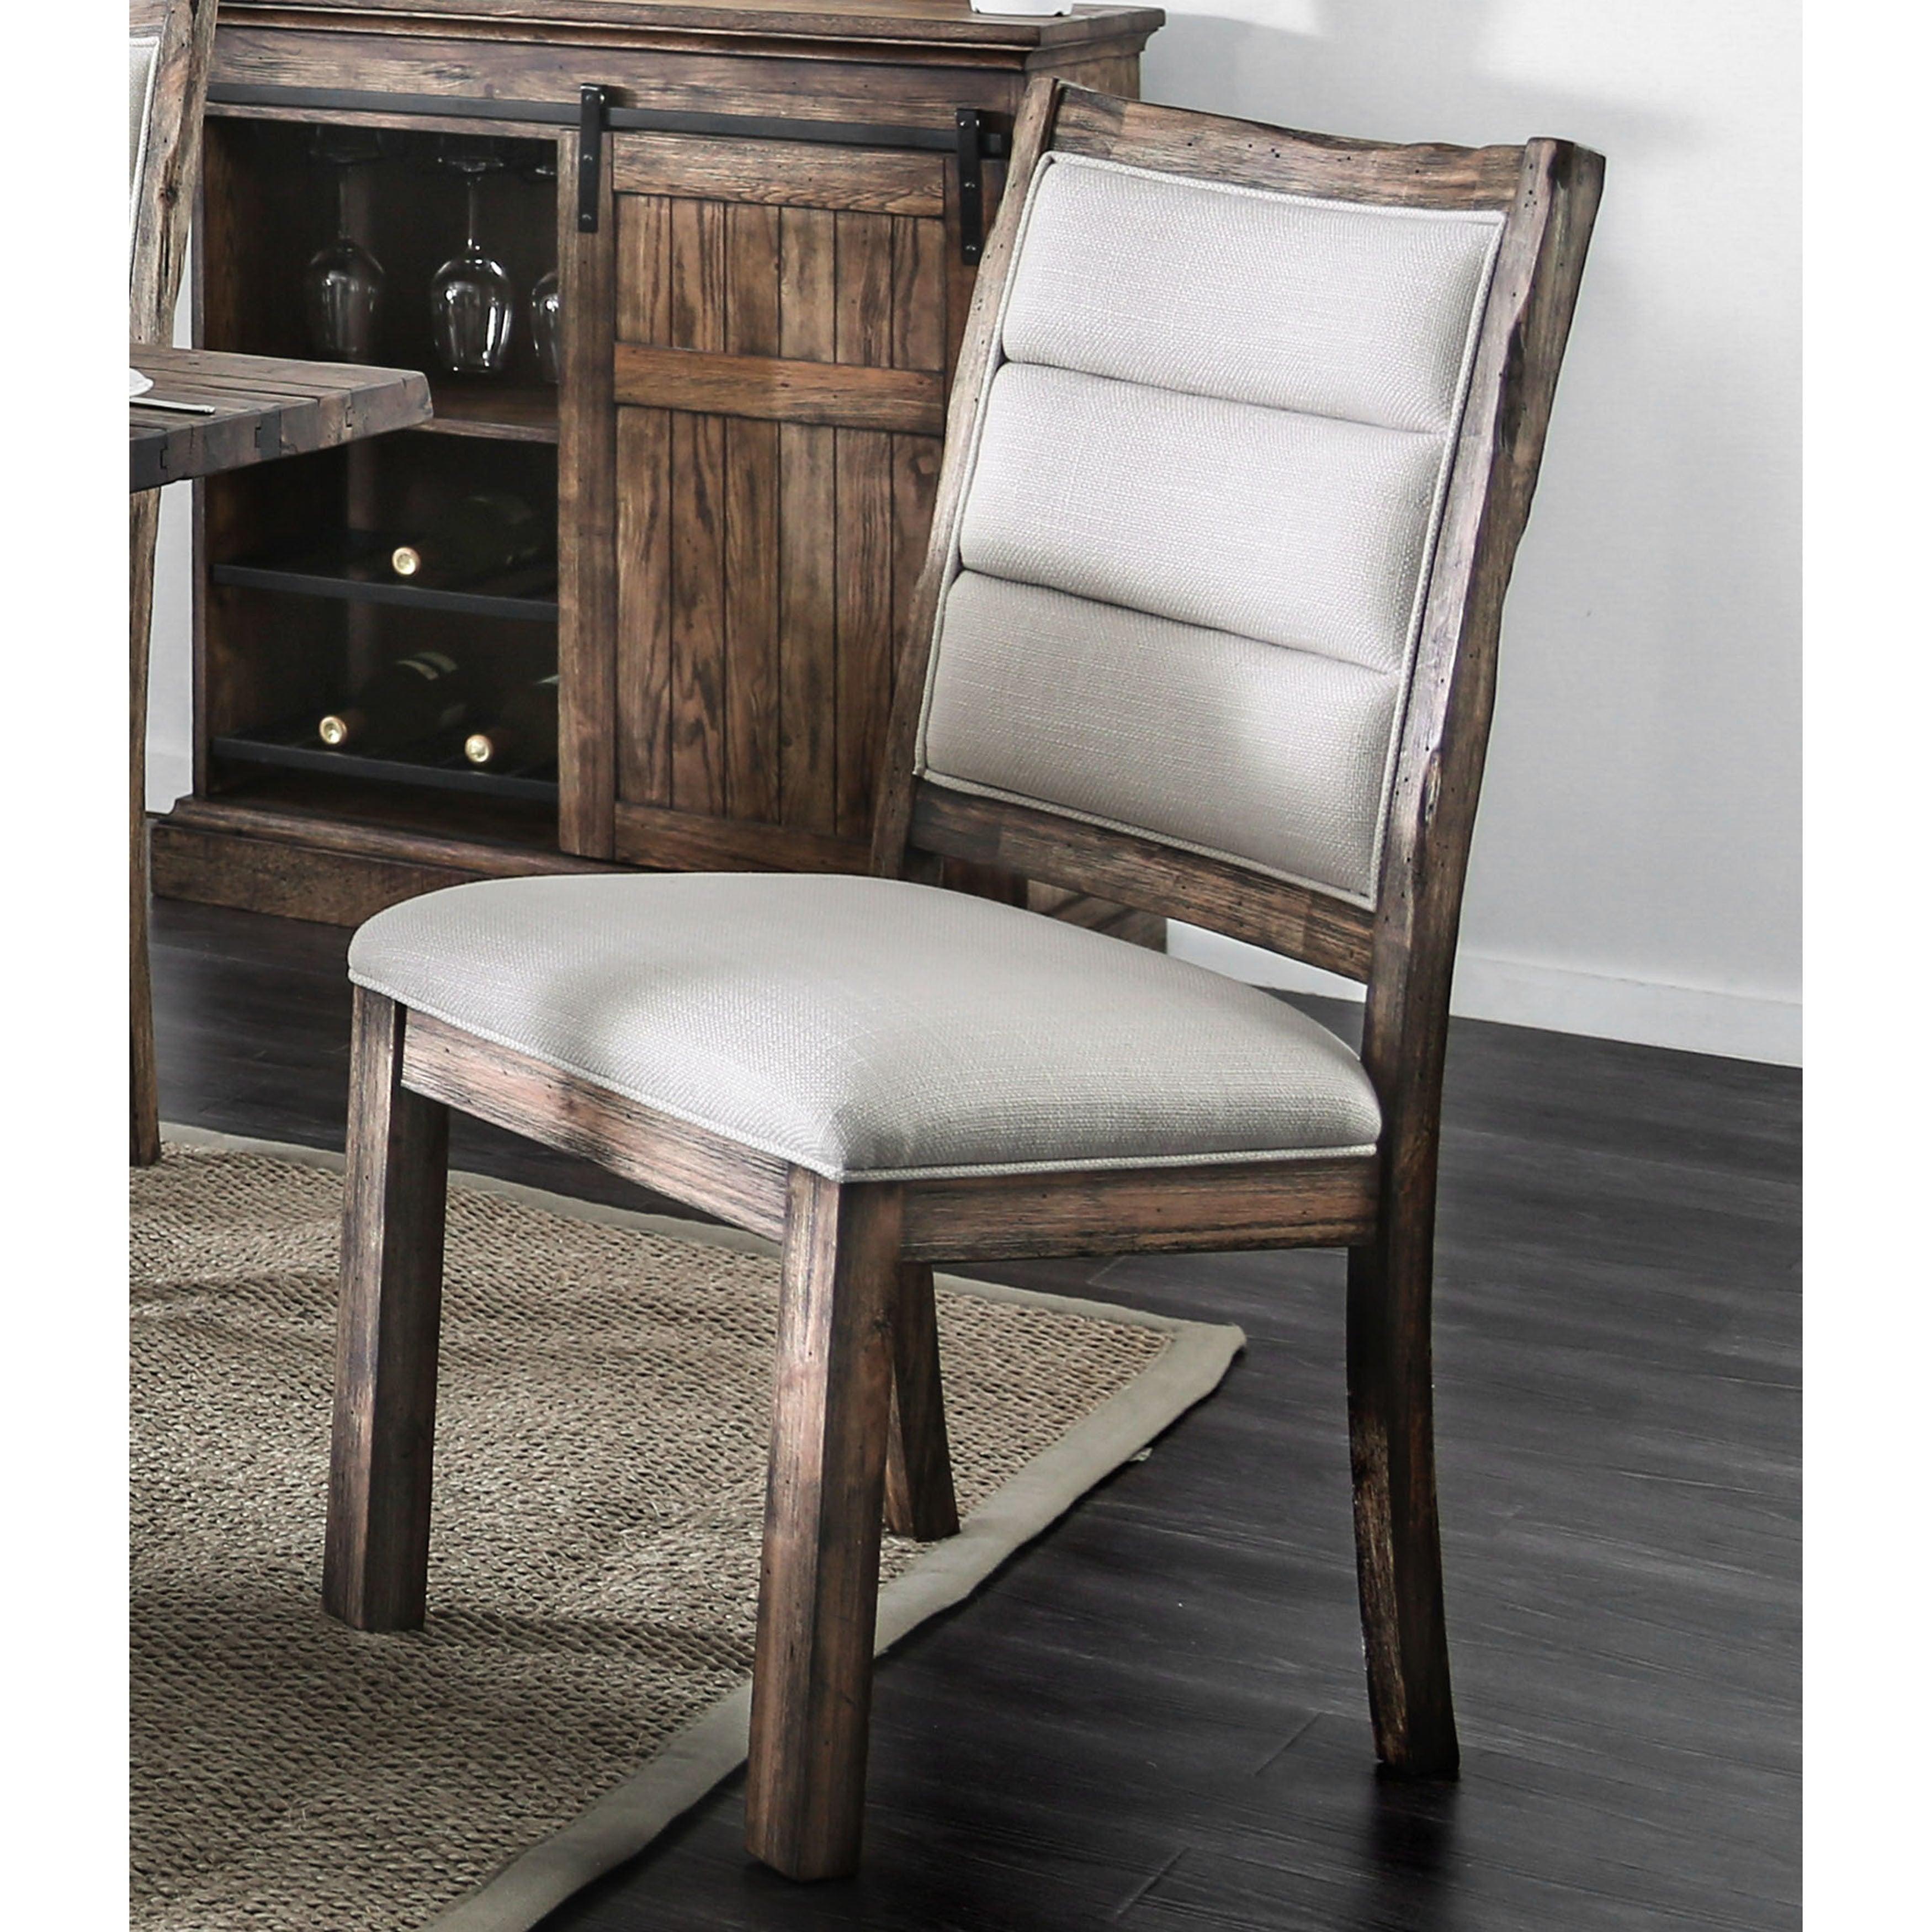 Furniture Of America Kelani Rustic Wooden Dining Chair.